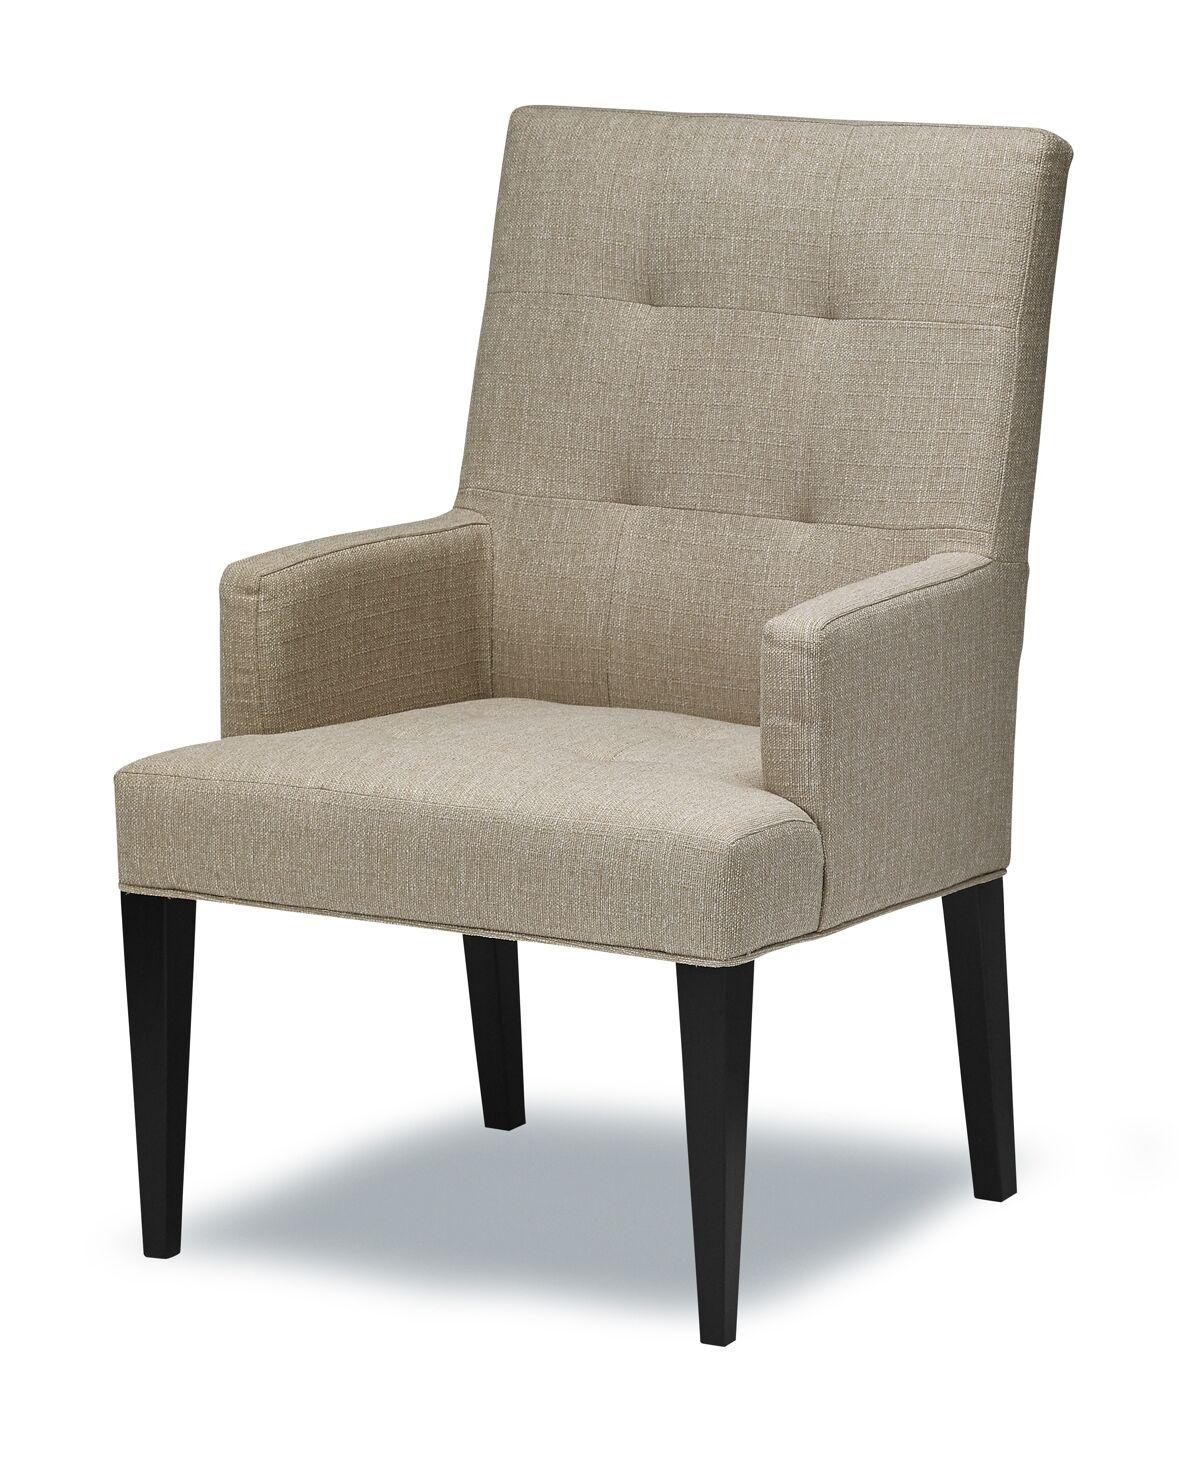 Thomaston Wing back Chair